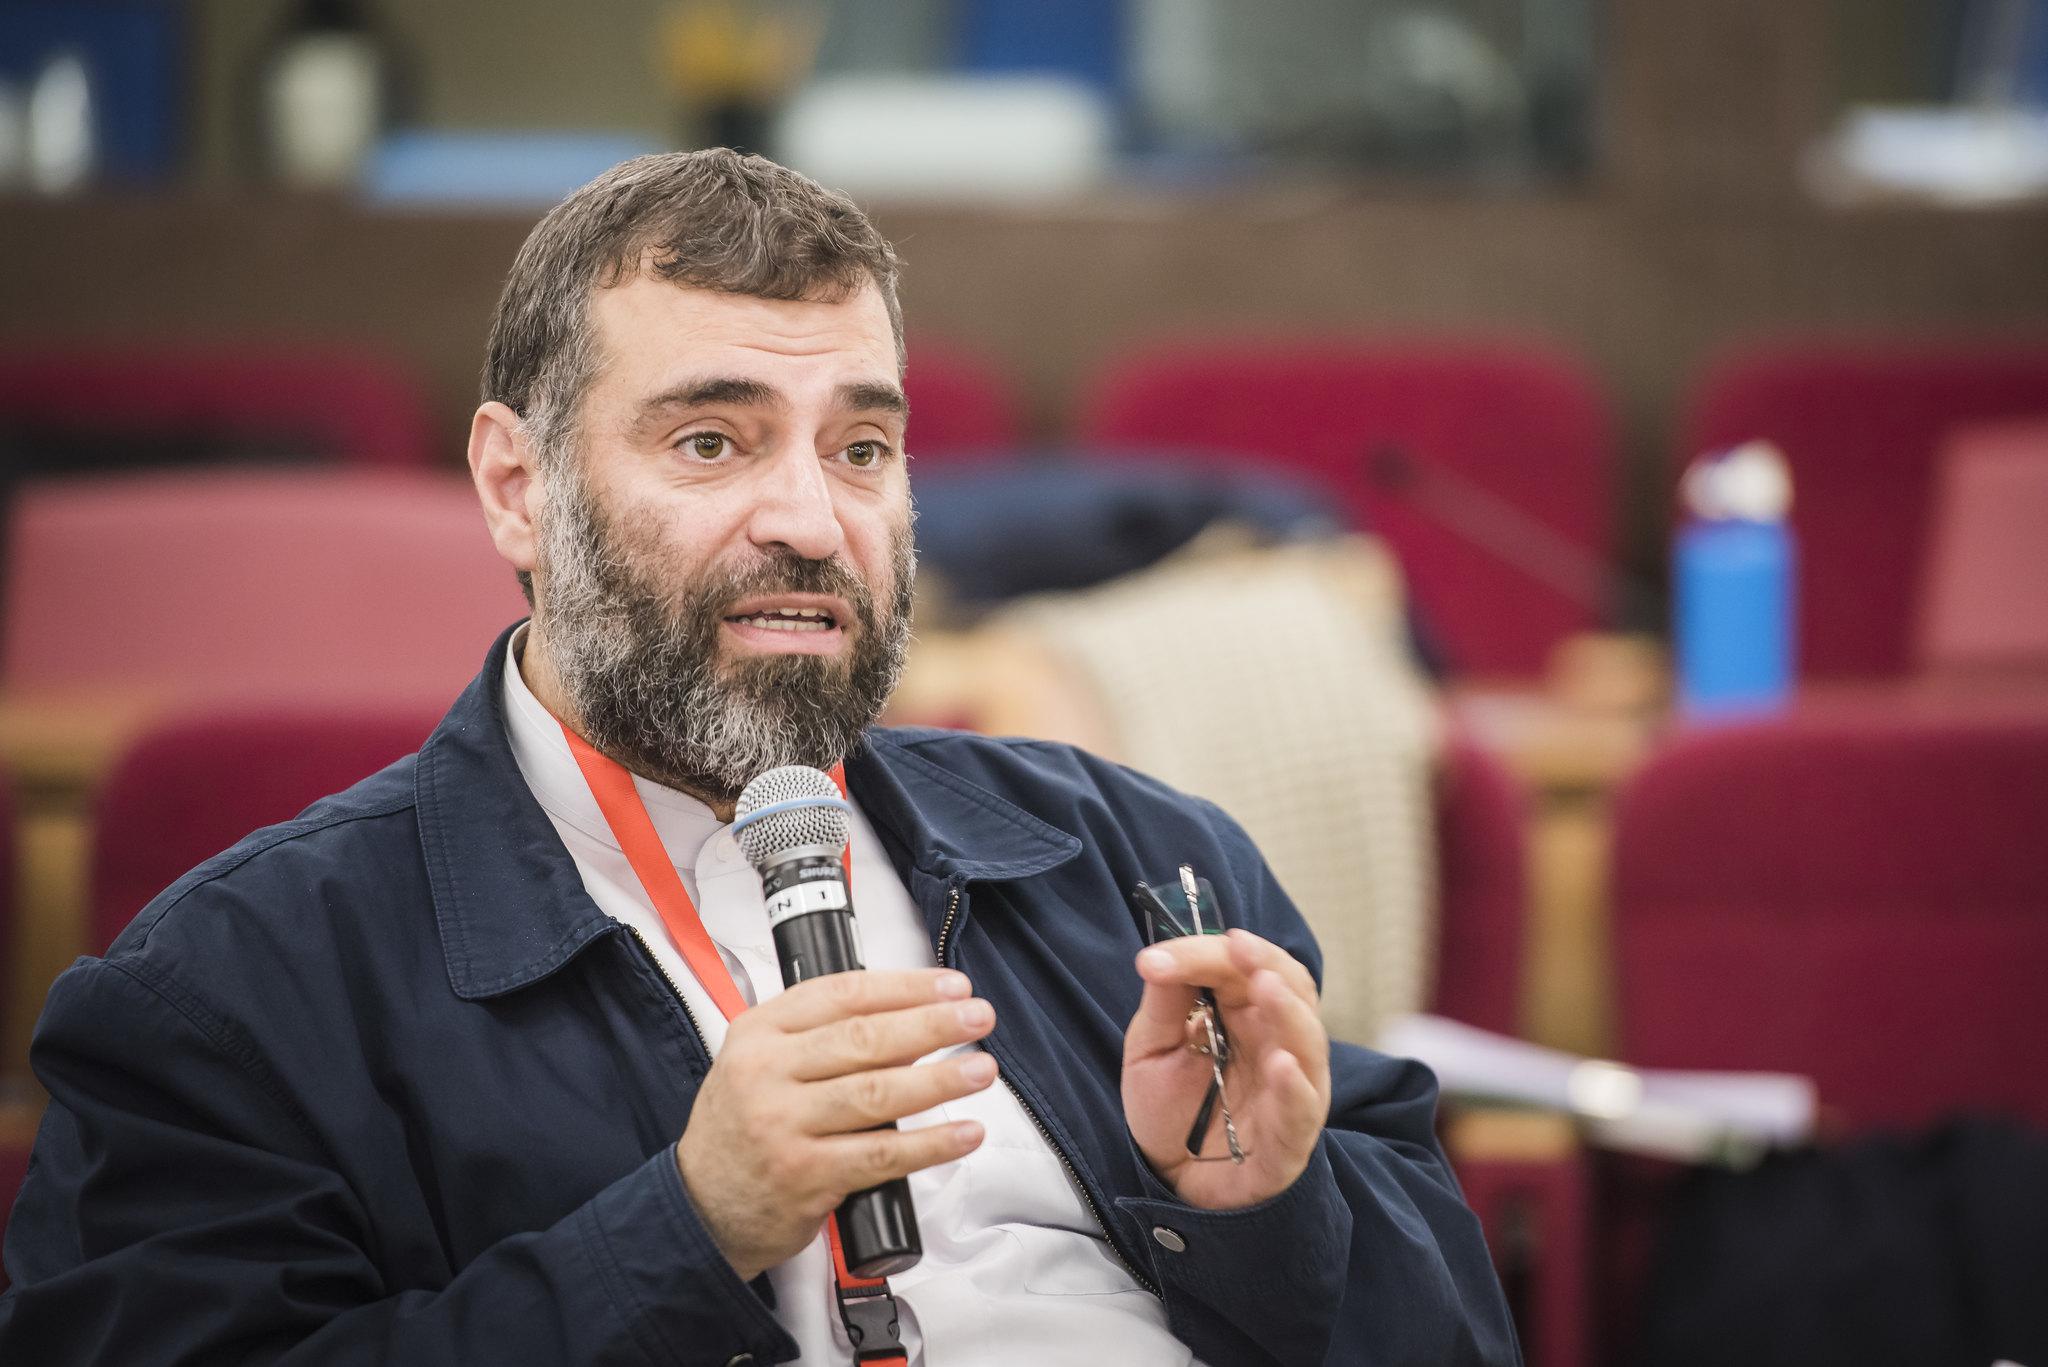 CCNE10 Regional Coordinator, Iran